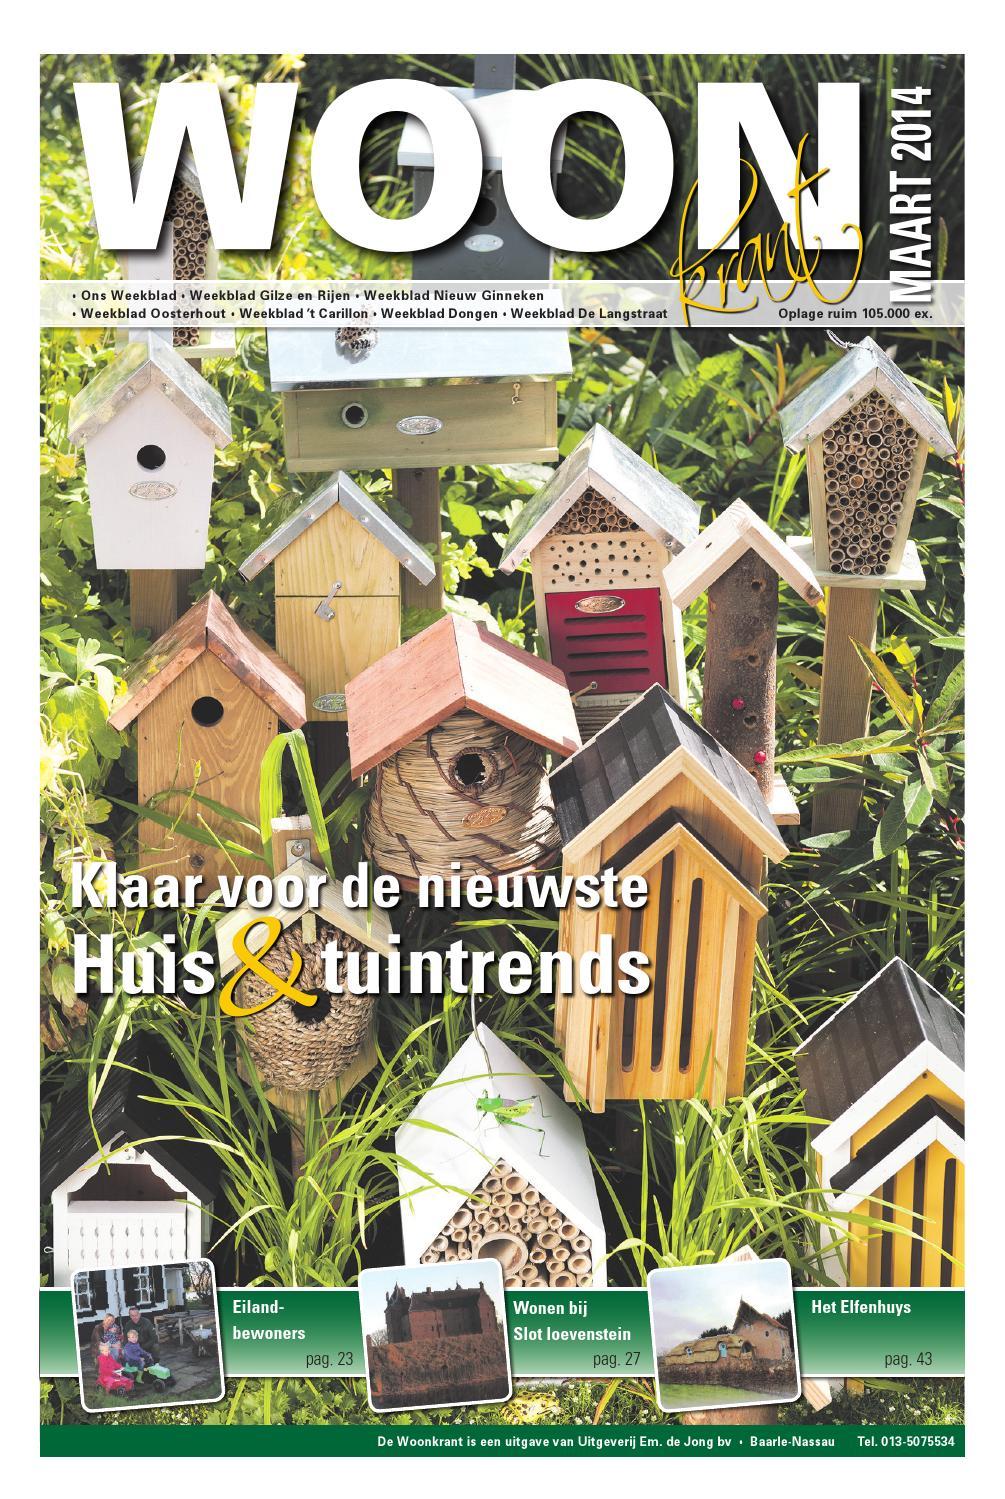 Woonkrant voorjaar 2014, editie west by uitgeverij em de jong   issuu